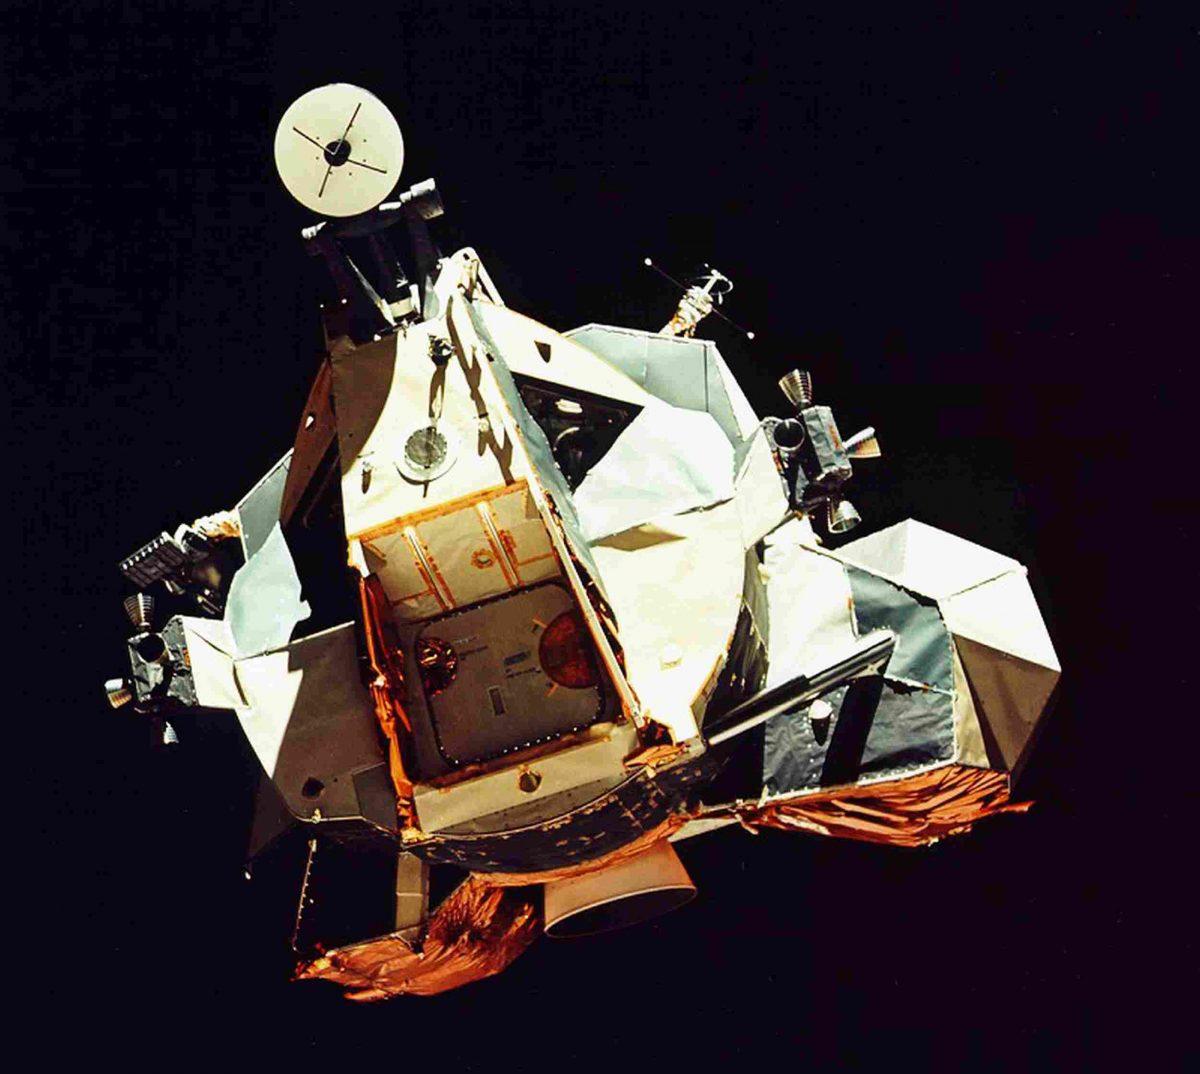 moon_02-1200x1074.jpg